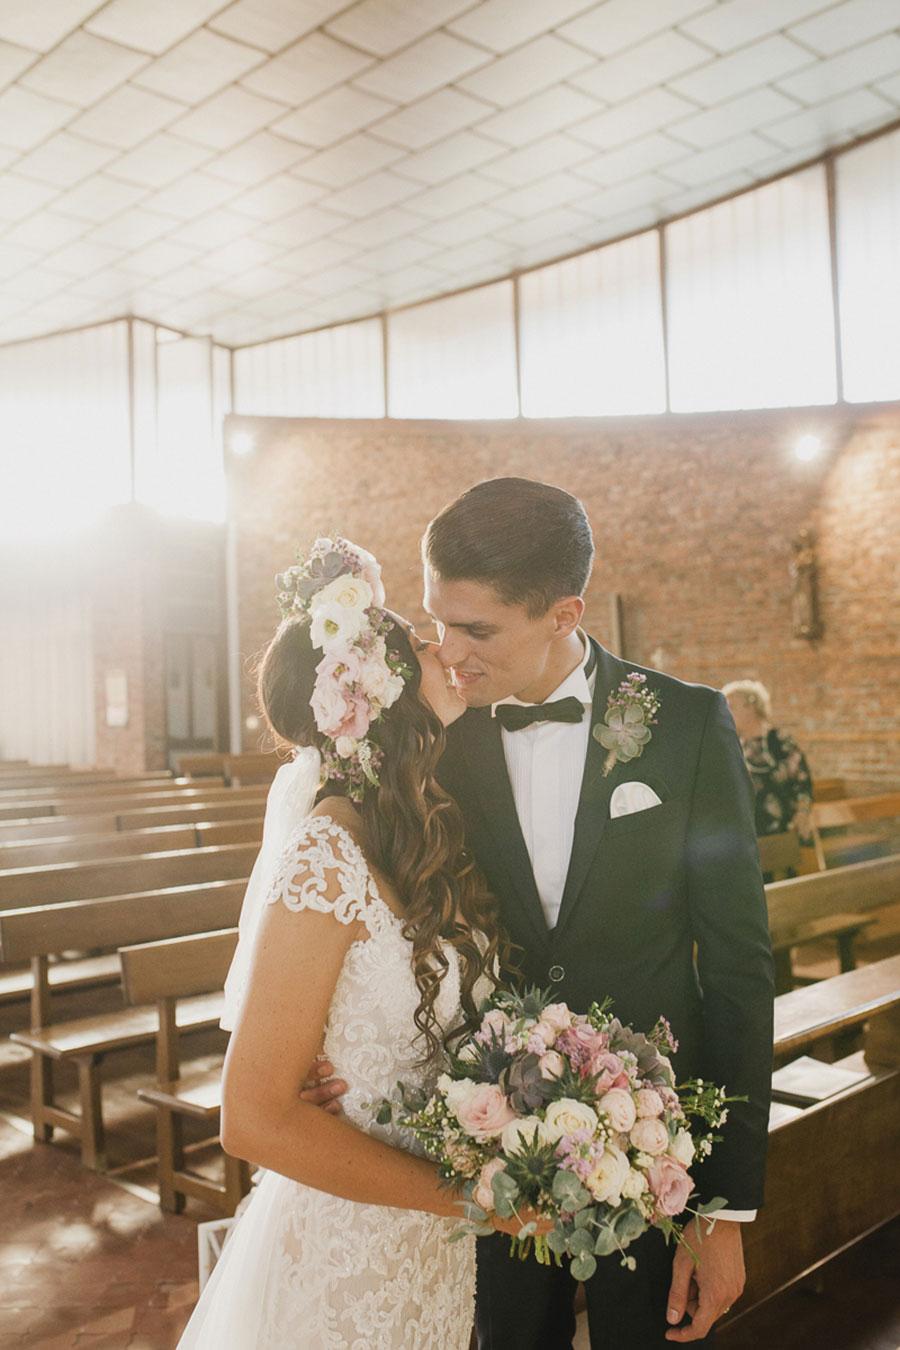 Wedding-Nicholad-and-Federica-Giuseppe-Giovannelli-125